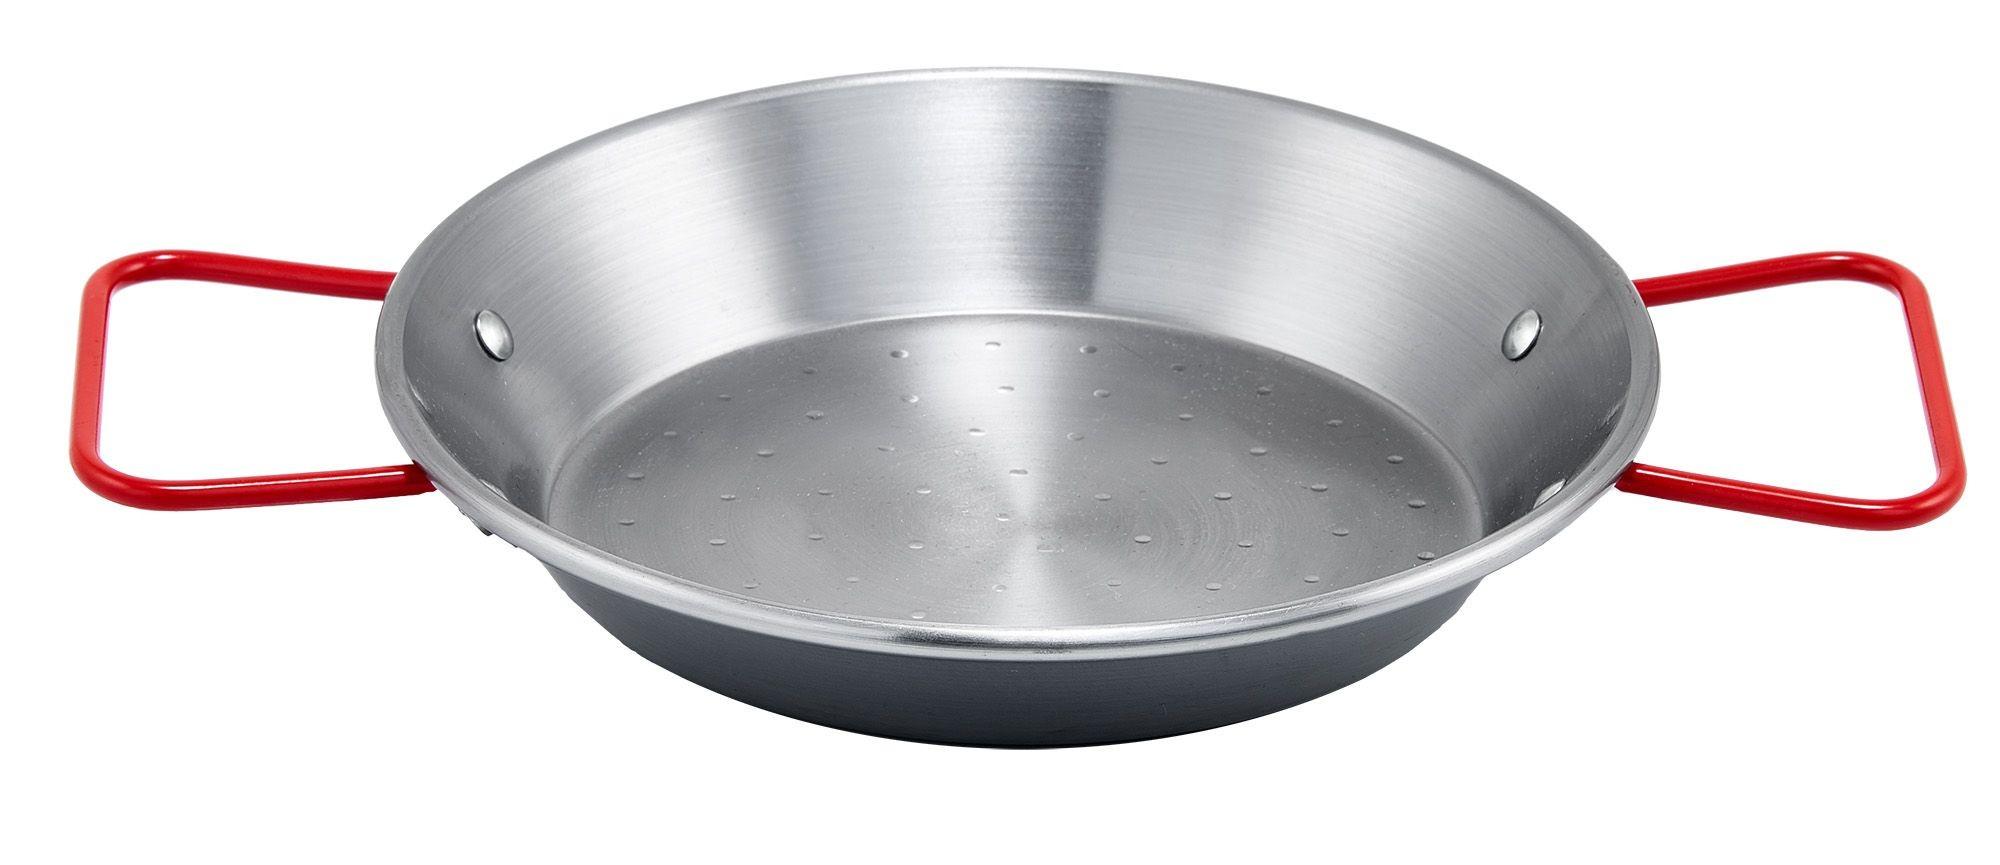 "Winco CSPP-11 Polished Carbon Steel 11"" Paella Pan"